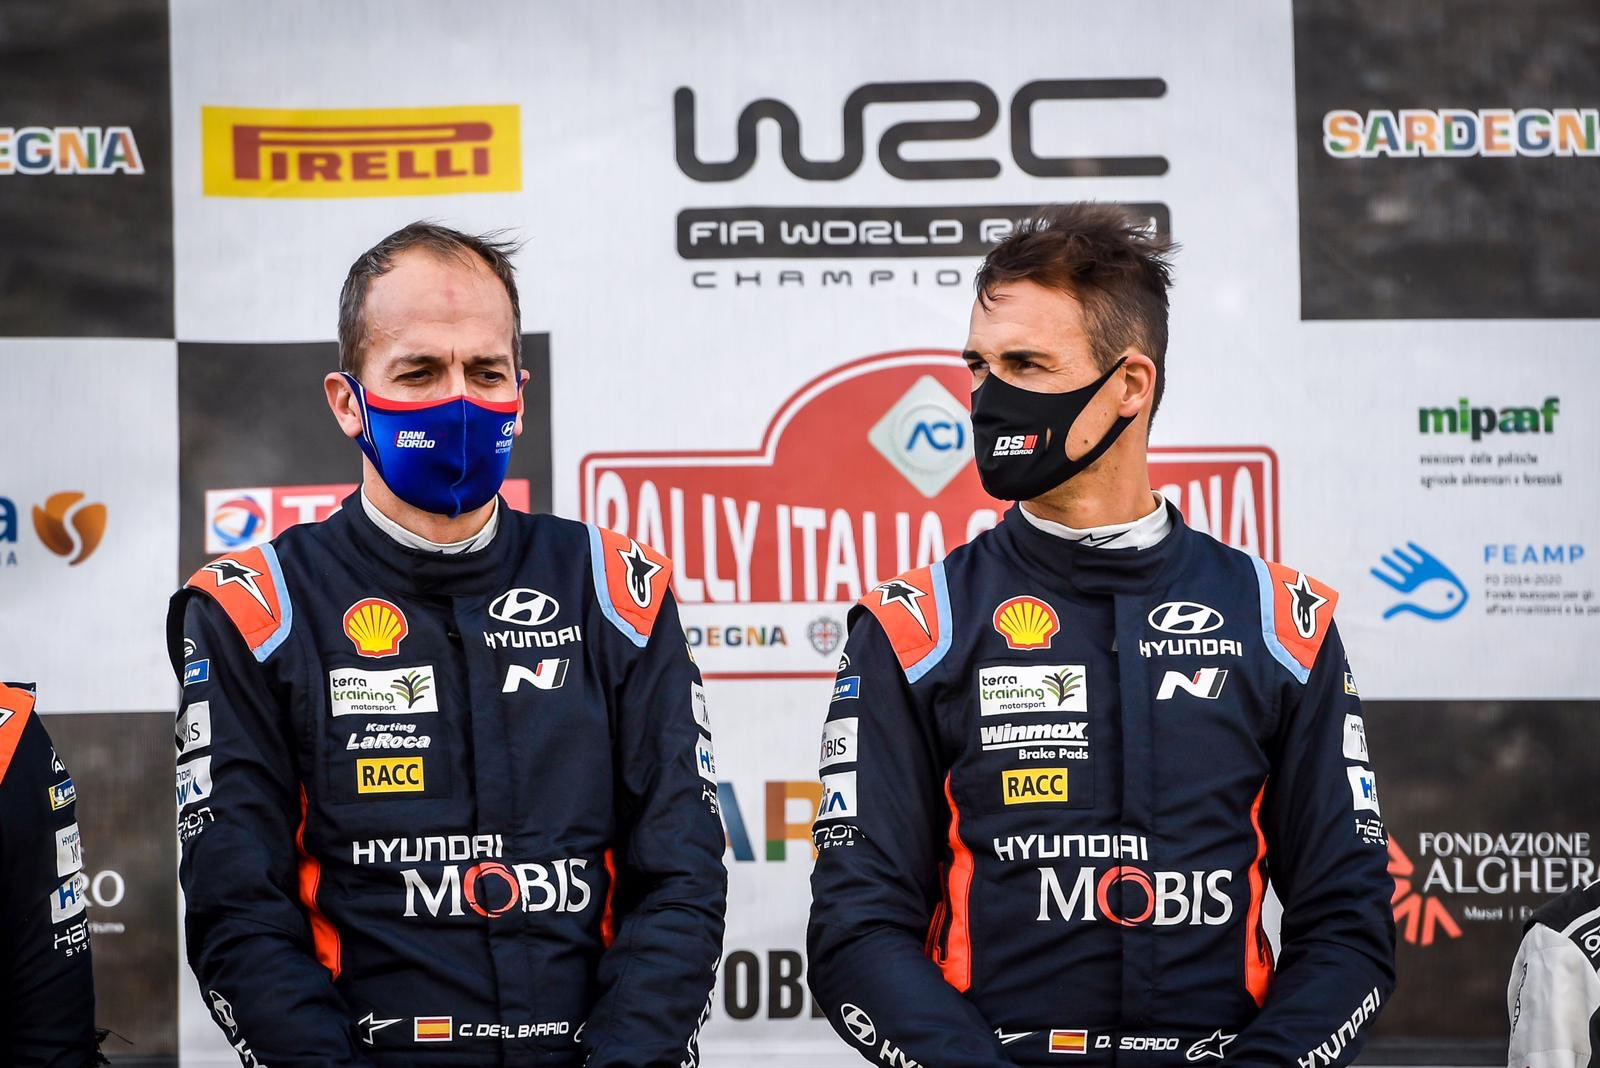 WRC: Rally d' Italia - Sardegna [8-10 Octubre] - Página 7 EkDAwiuXgAEQBIi?format=jpg&name=large